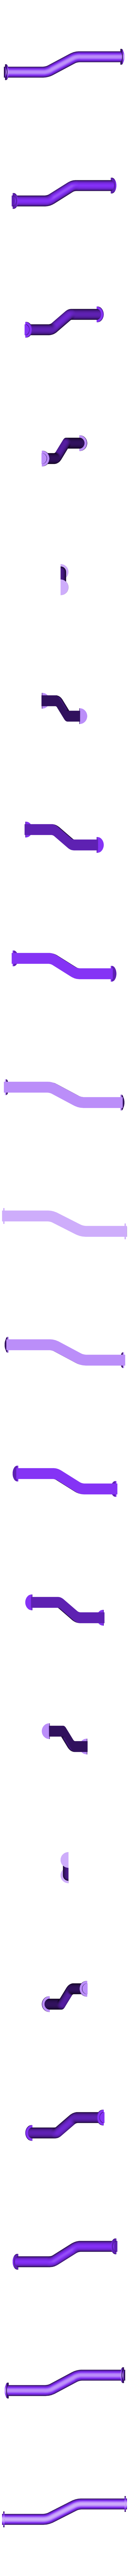 steam_pipe_bent-a.STL Download free STL file 4-8-8-4 Big Boy Locomotive • 3D printer object, RaymondDeLuca